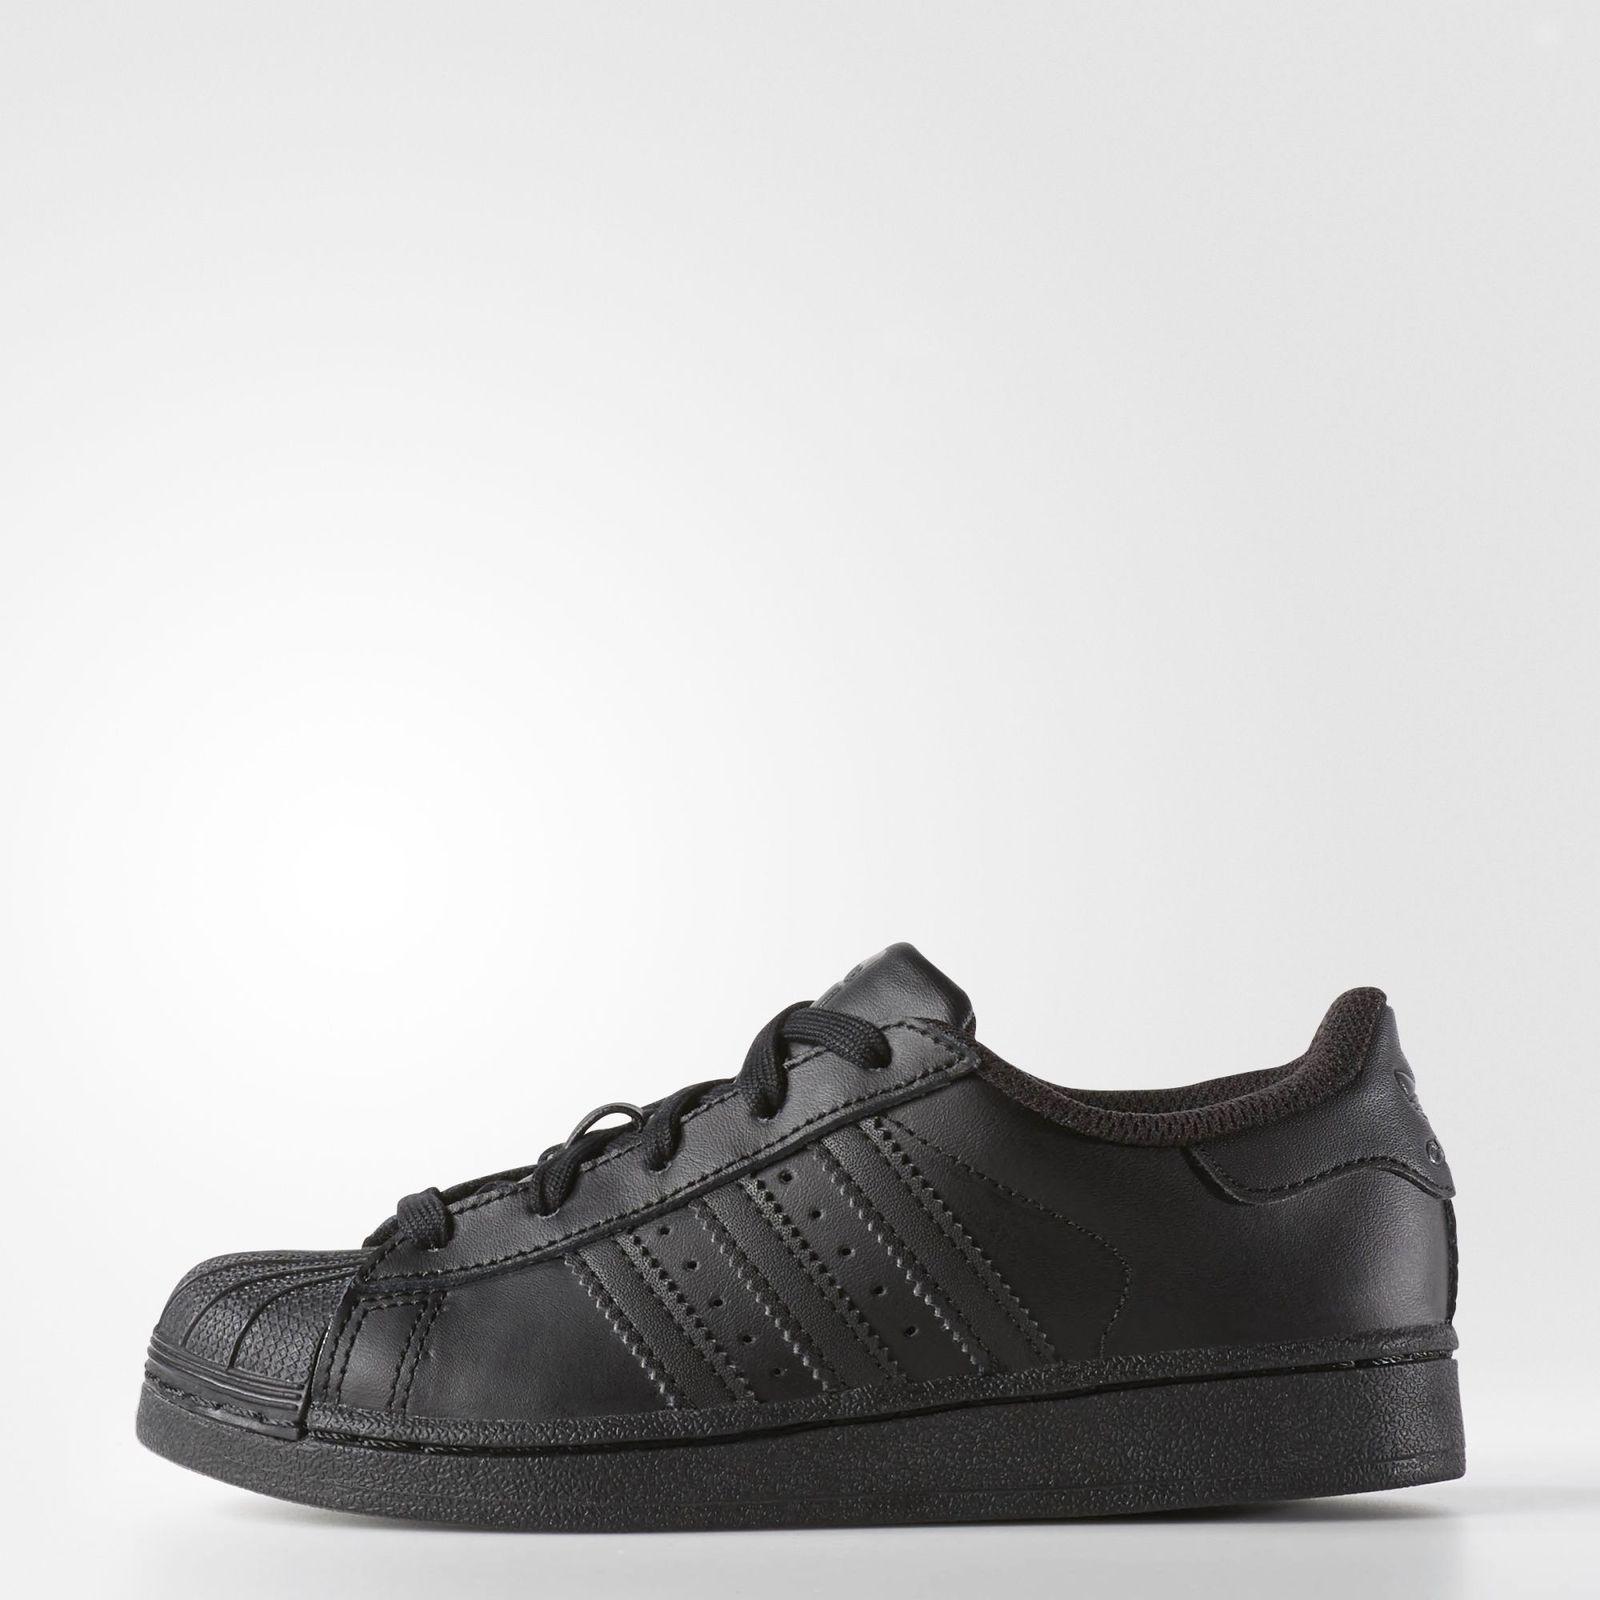 , 55, 55, , 54 per cento.nuove adidas superstar scarpe originali. 983911